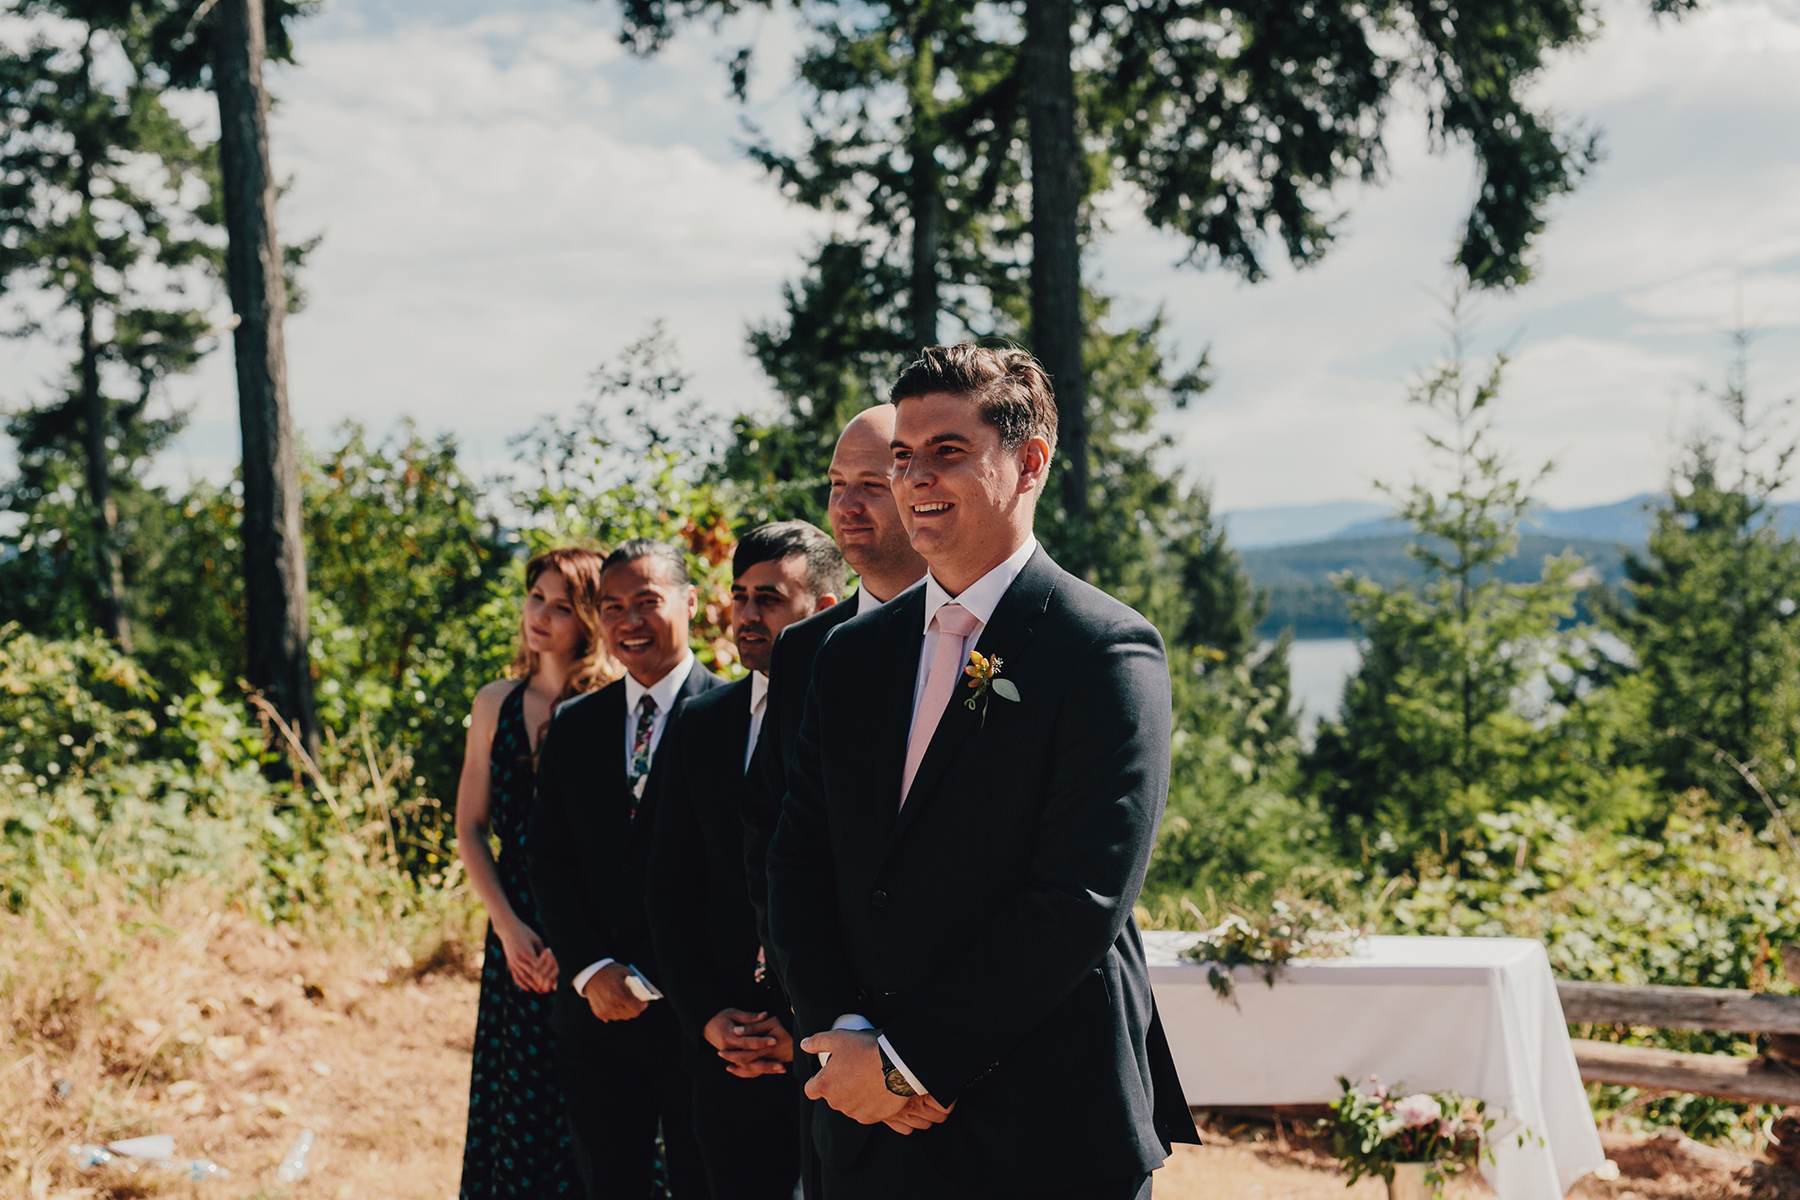 bodega-ridge-wedding-photos-0061.jpg